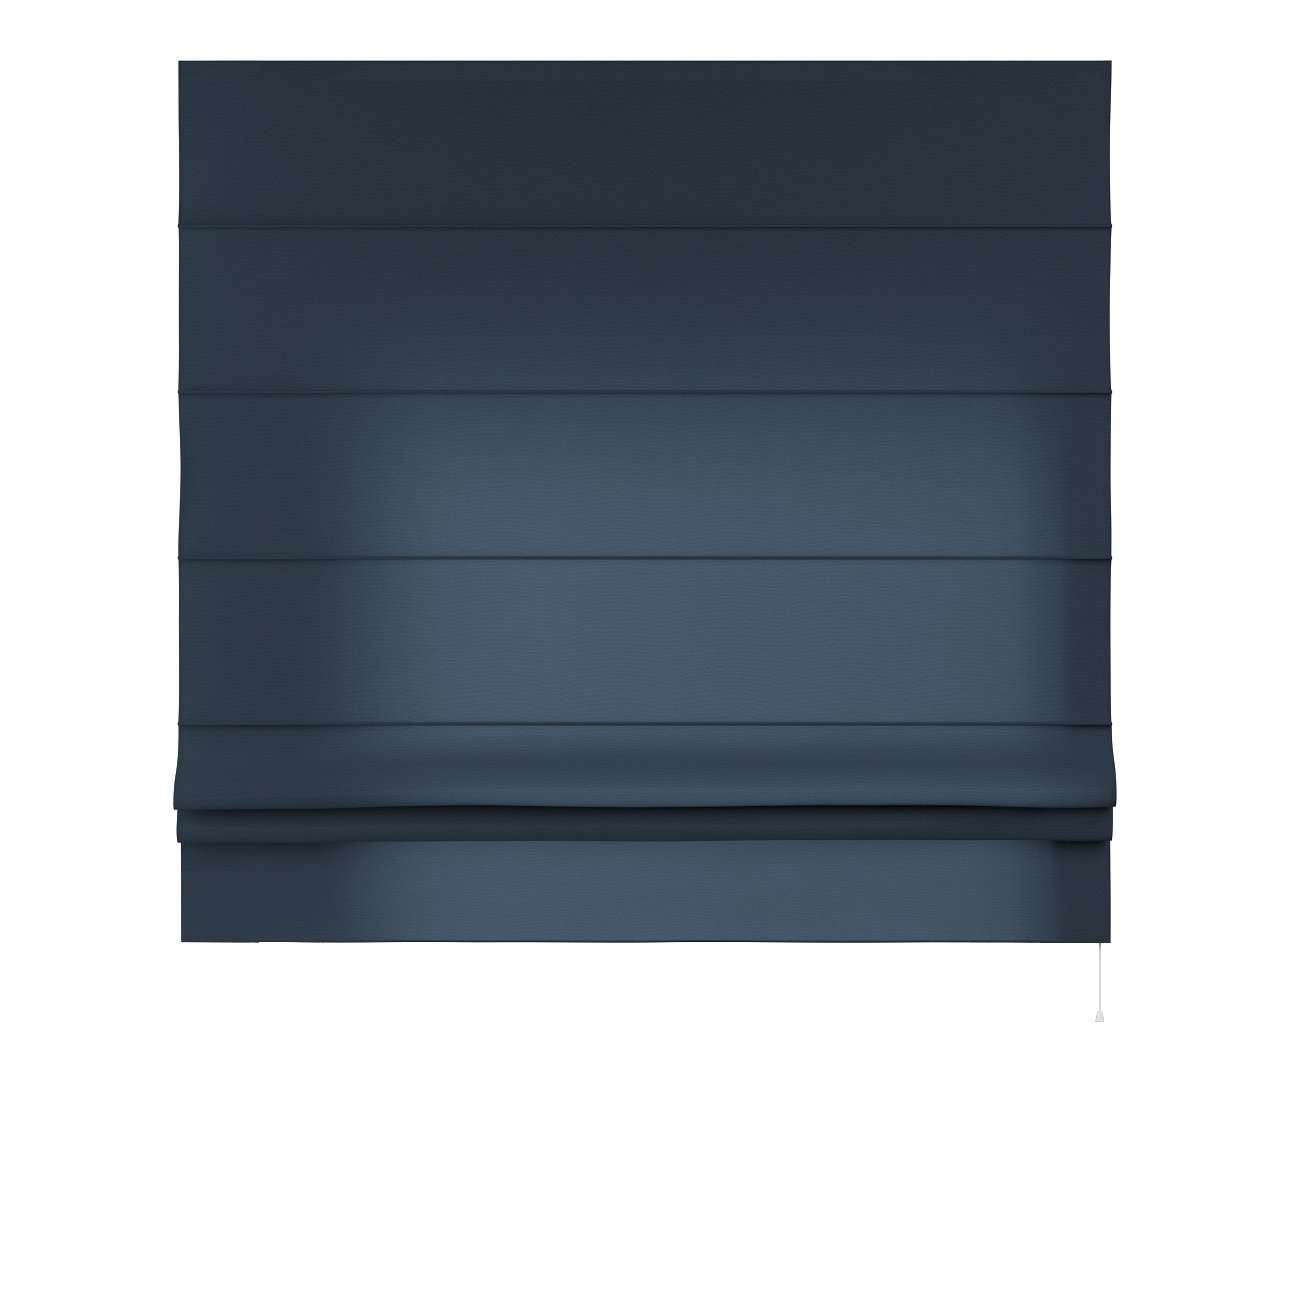 Vouwgordijn Padva 80 x 170 cm van de collectie Quadro, Stof: 136-04